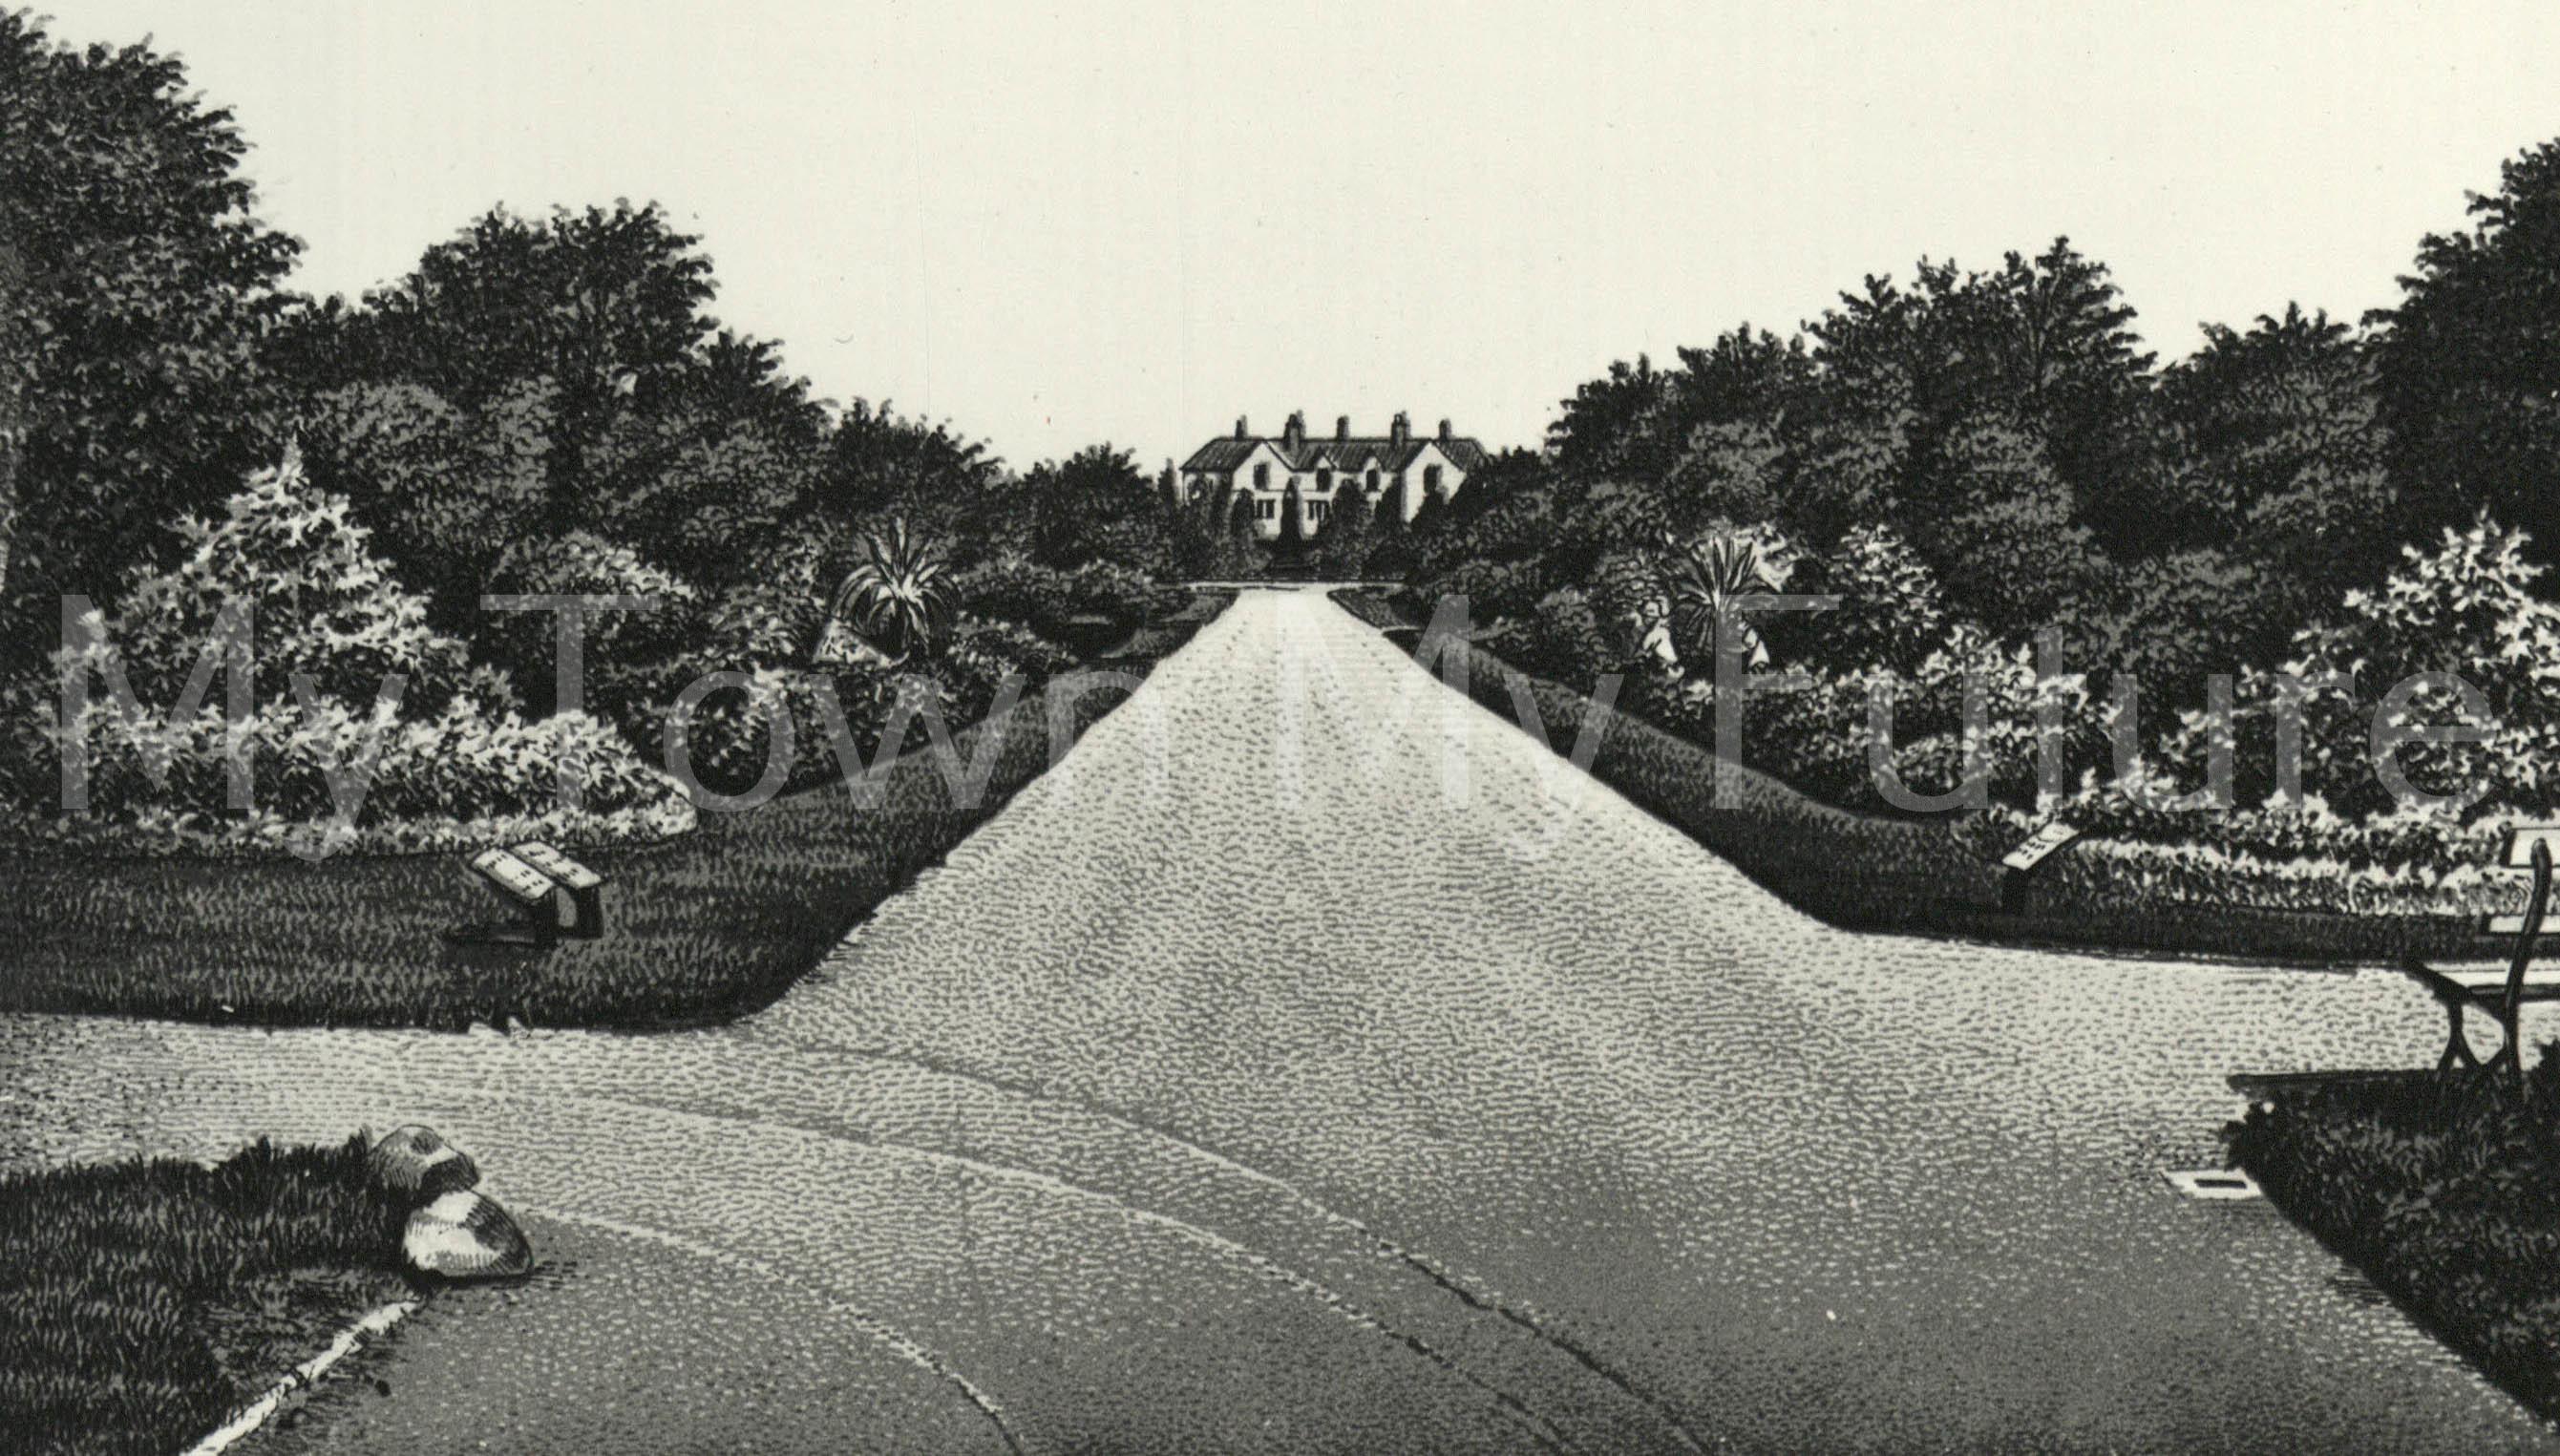 Albert Park - View looking North, c1900